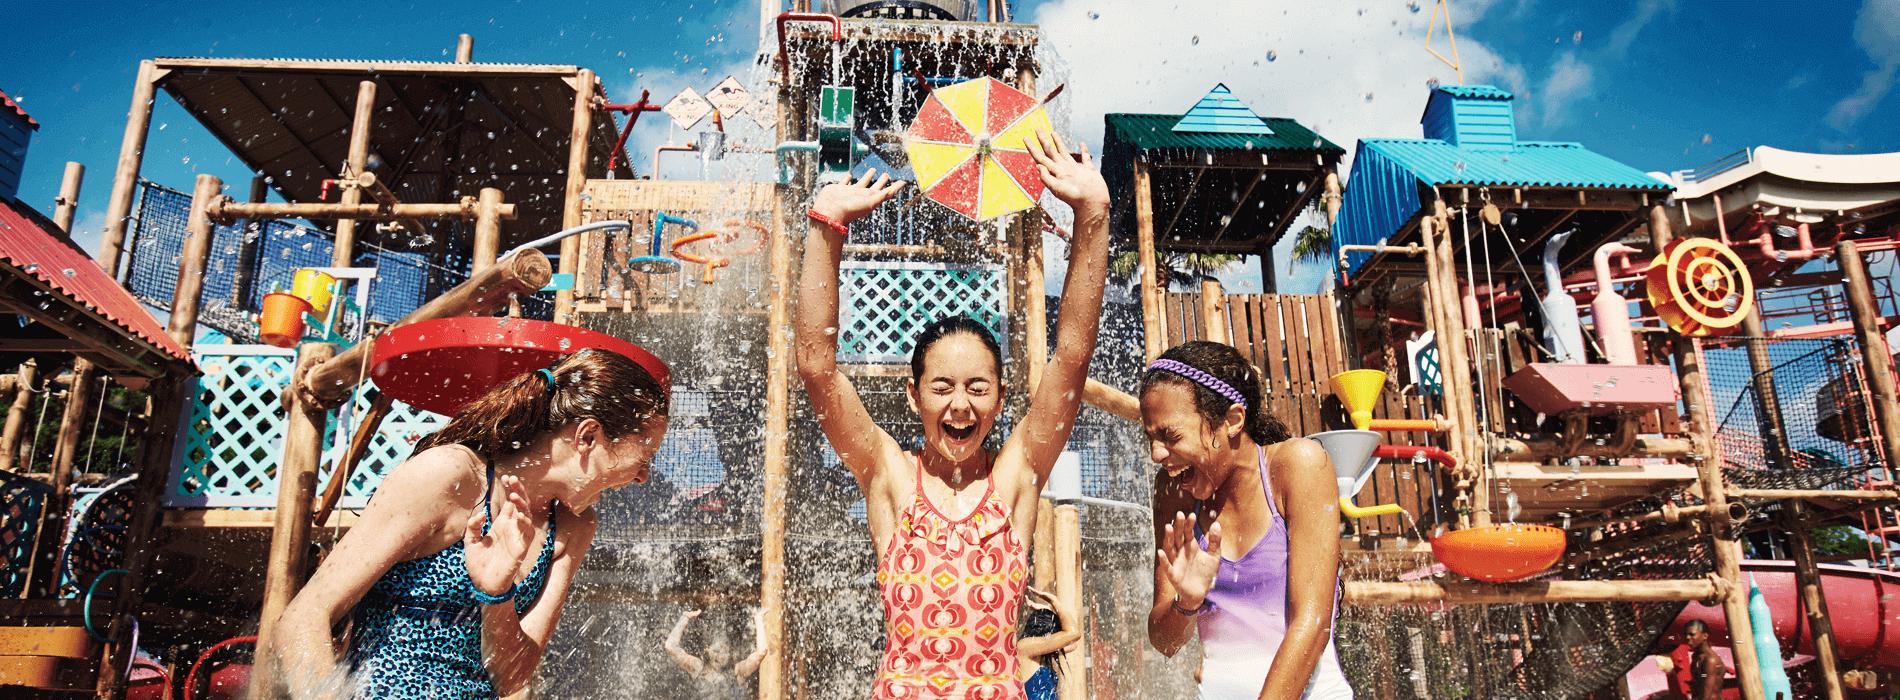 Splash Attack Pool at Adventure Island Tampa Bay